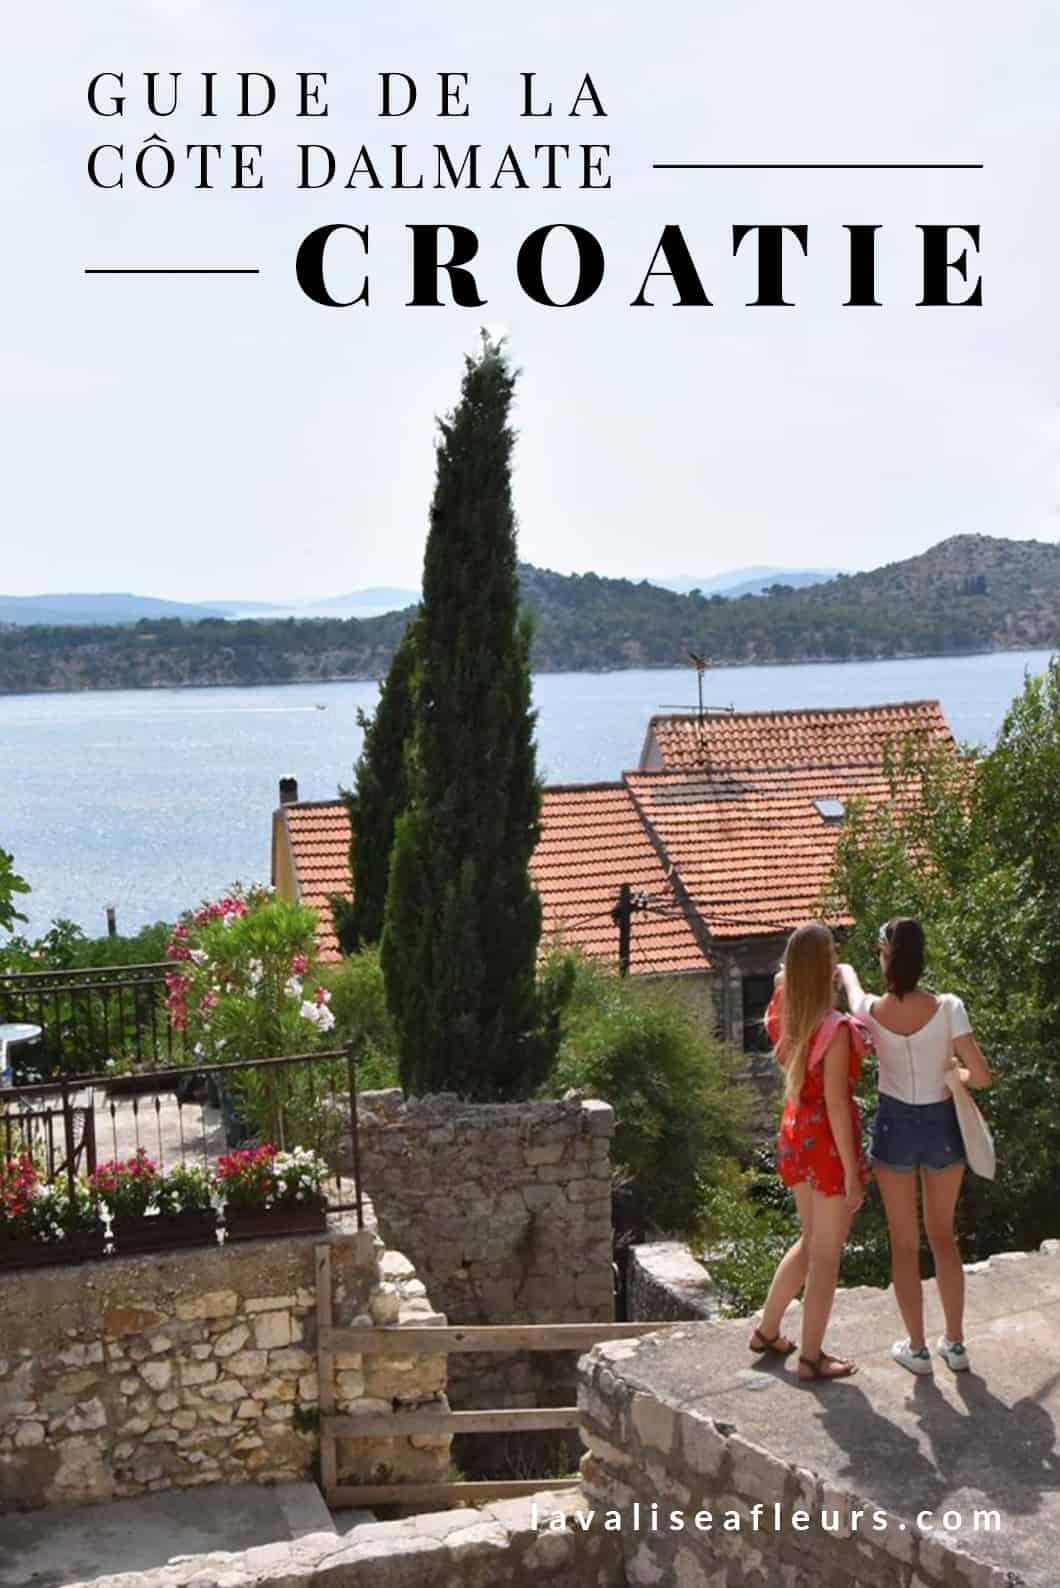 Guide de la Côte Dalmate en Croatie